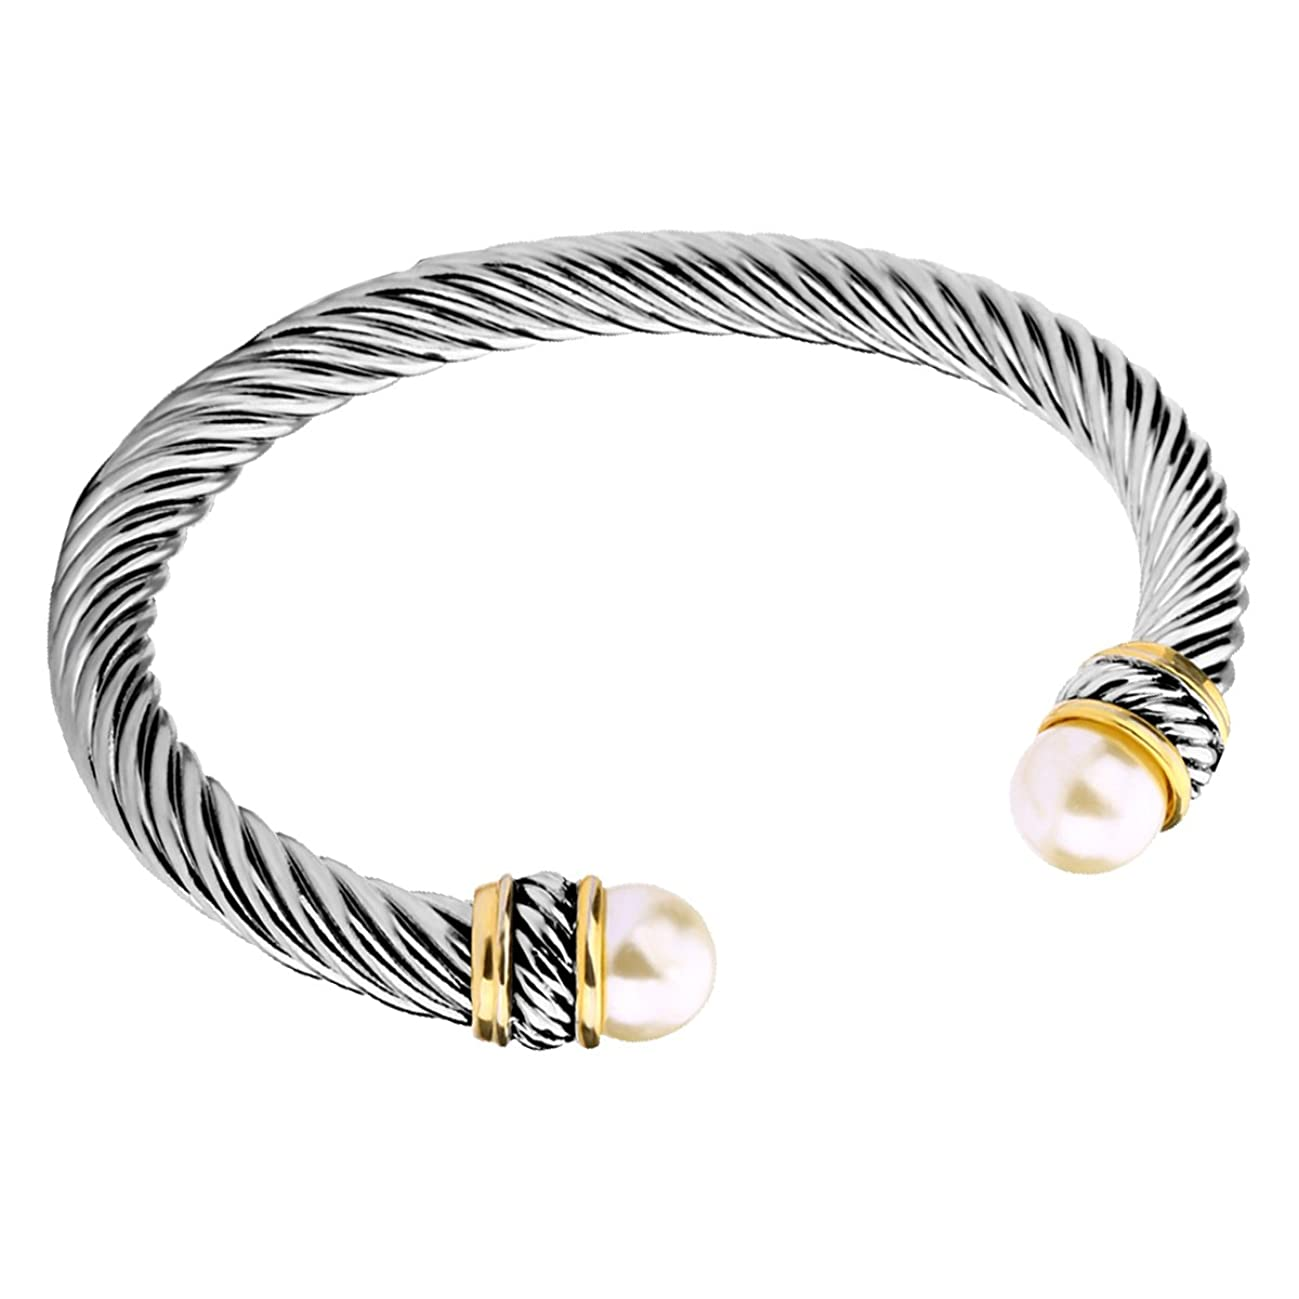 UNY Fashion Jewelry Brand Cable Wire Bangle Elegant Beautiful Imitation Pearl Valentine